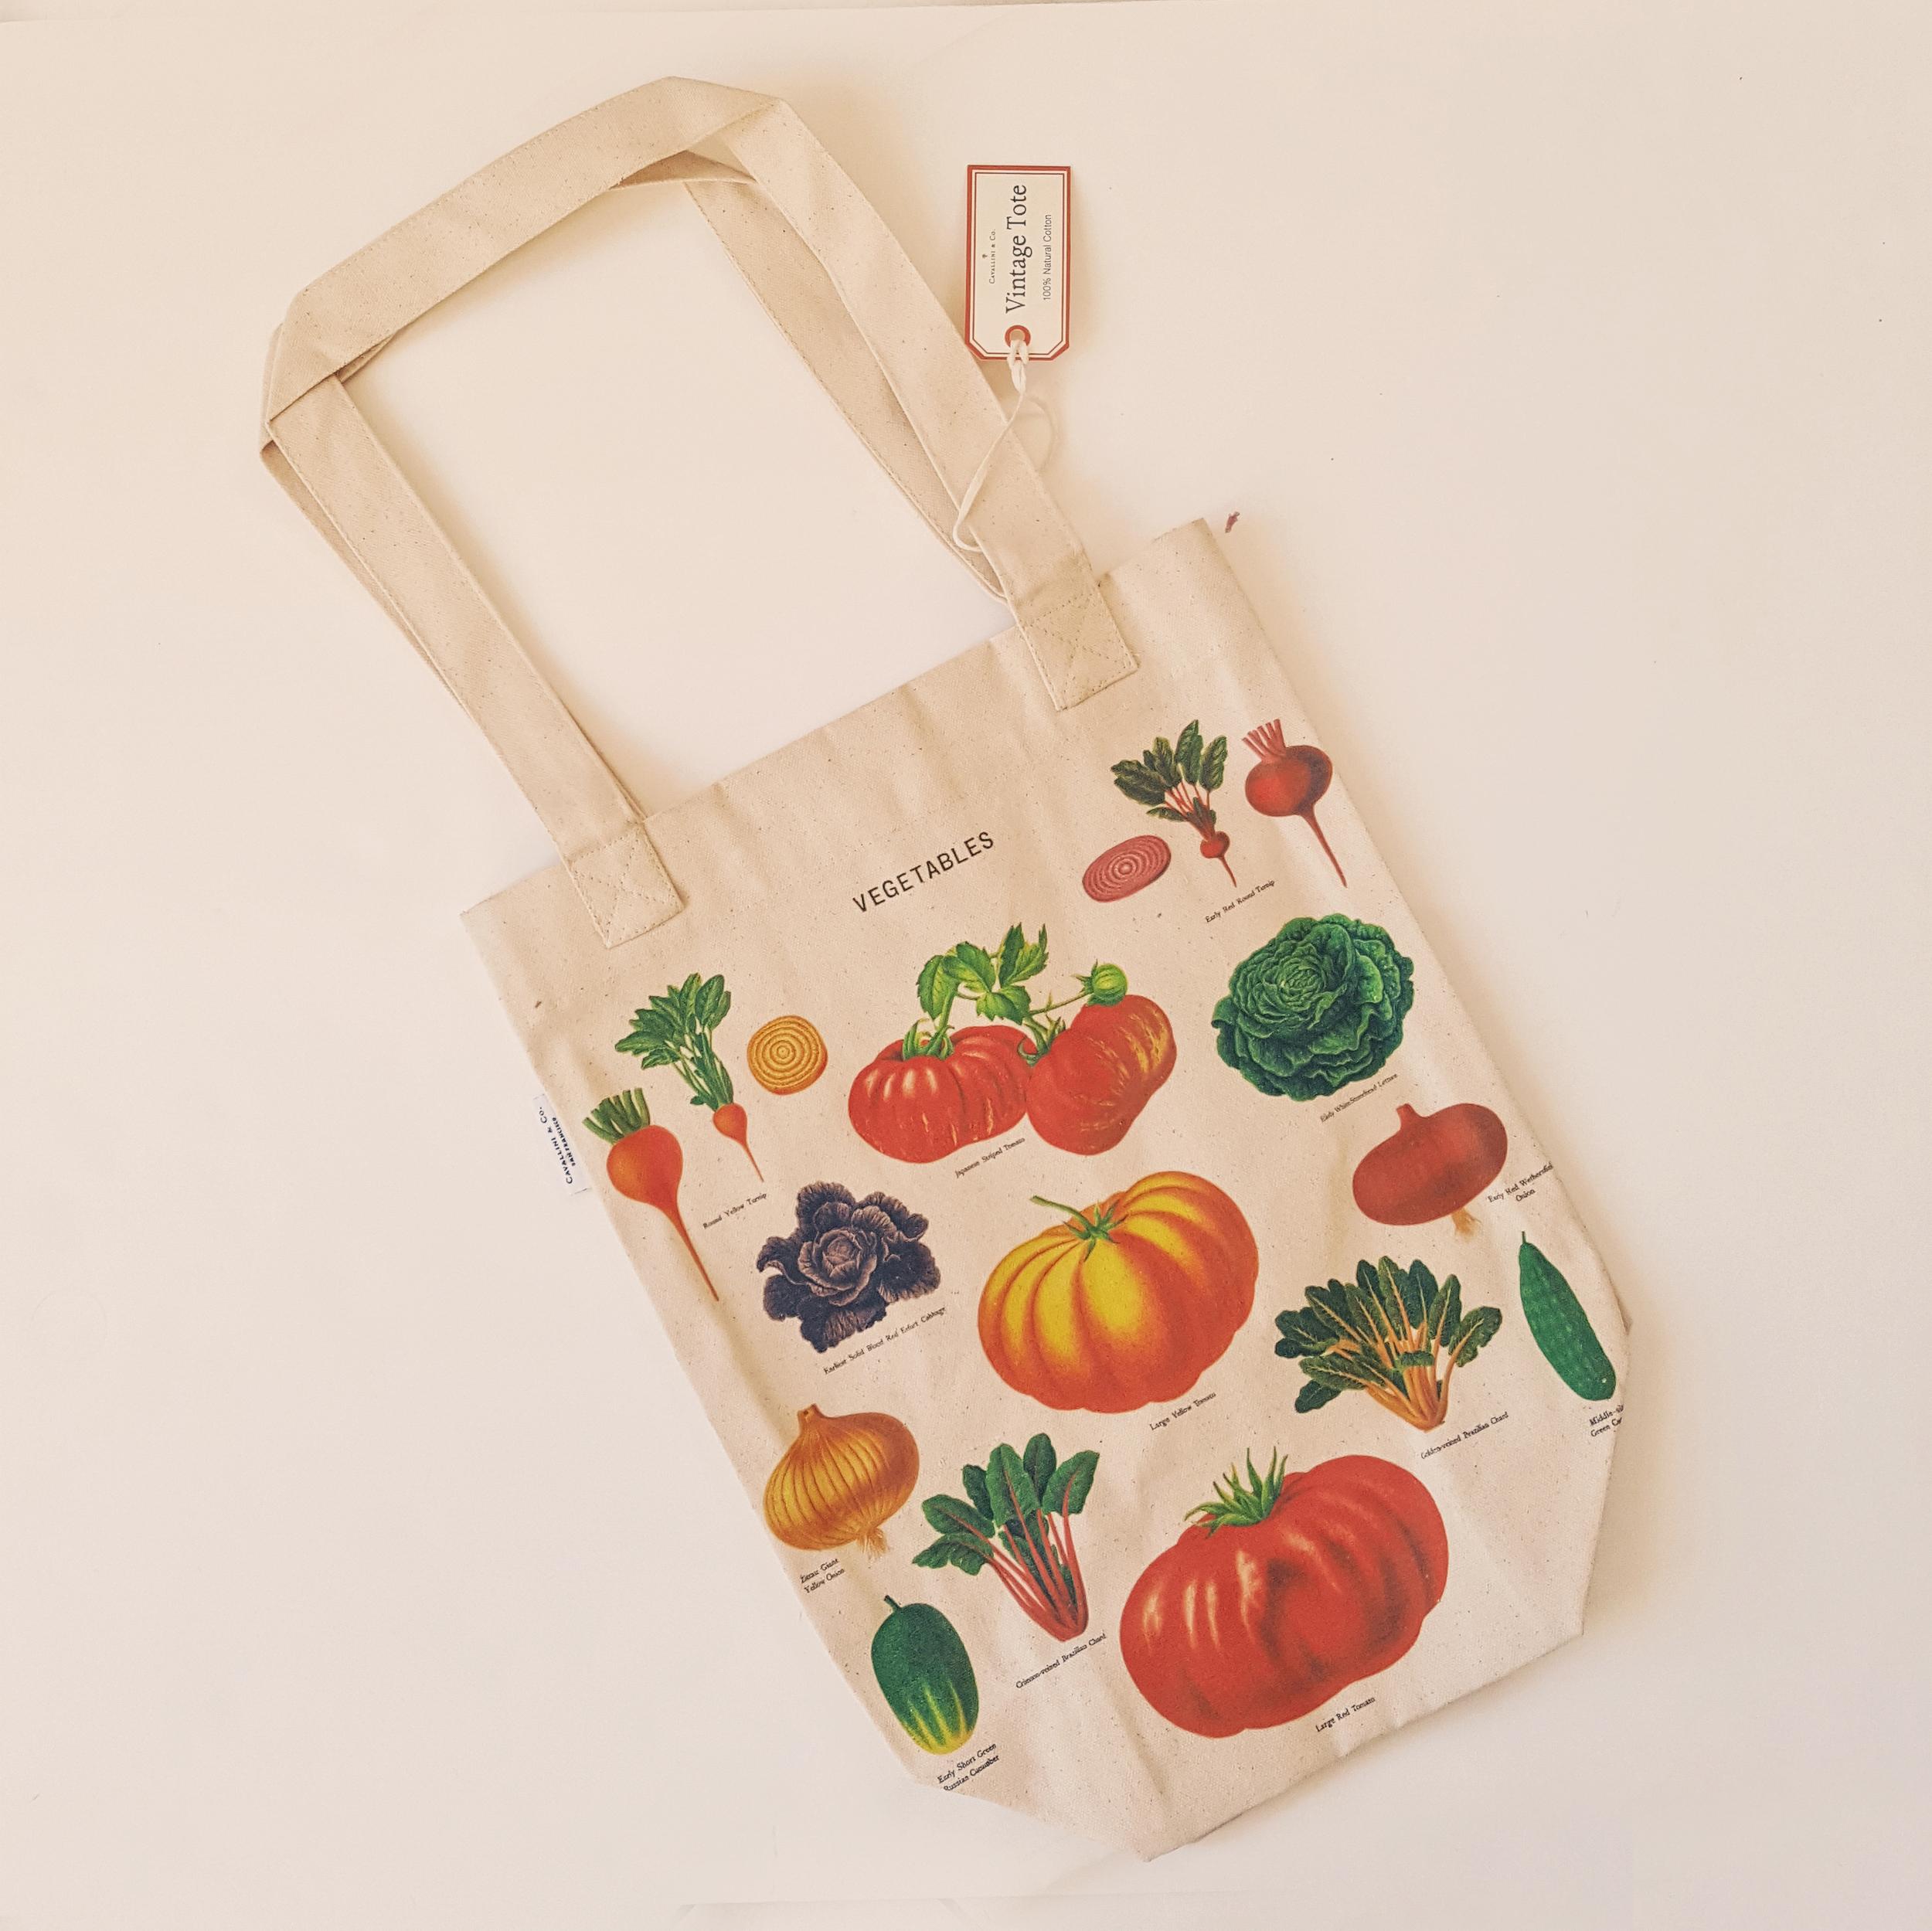 sac-toile-légumes-potager